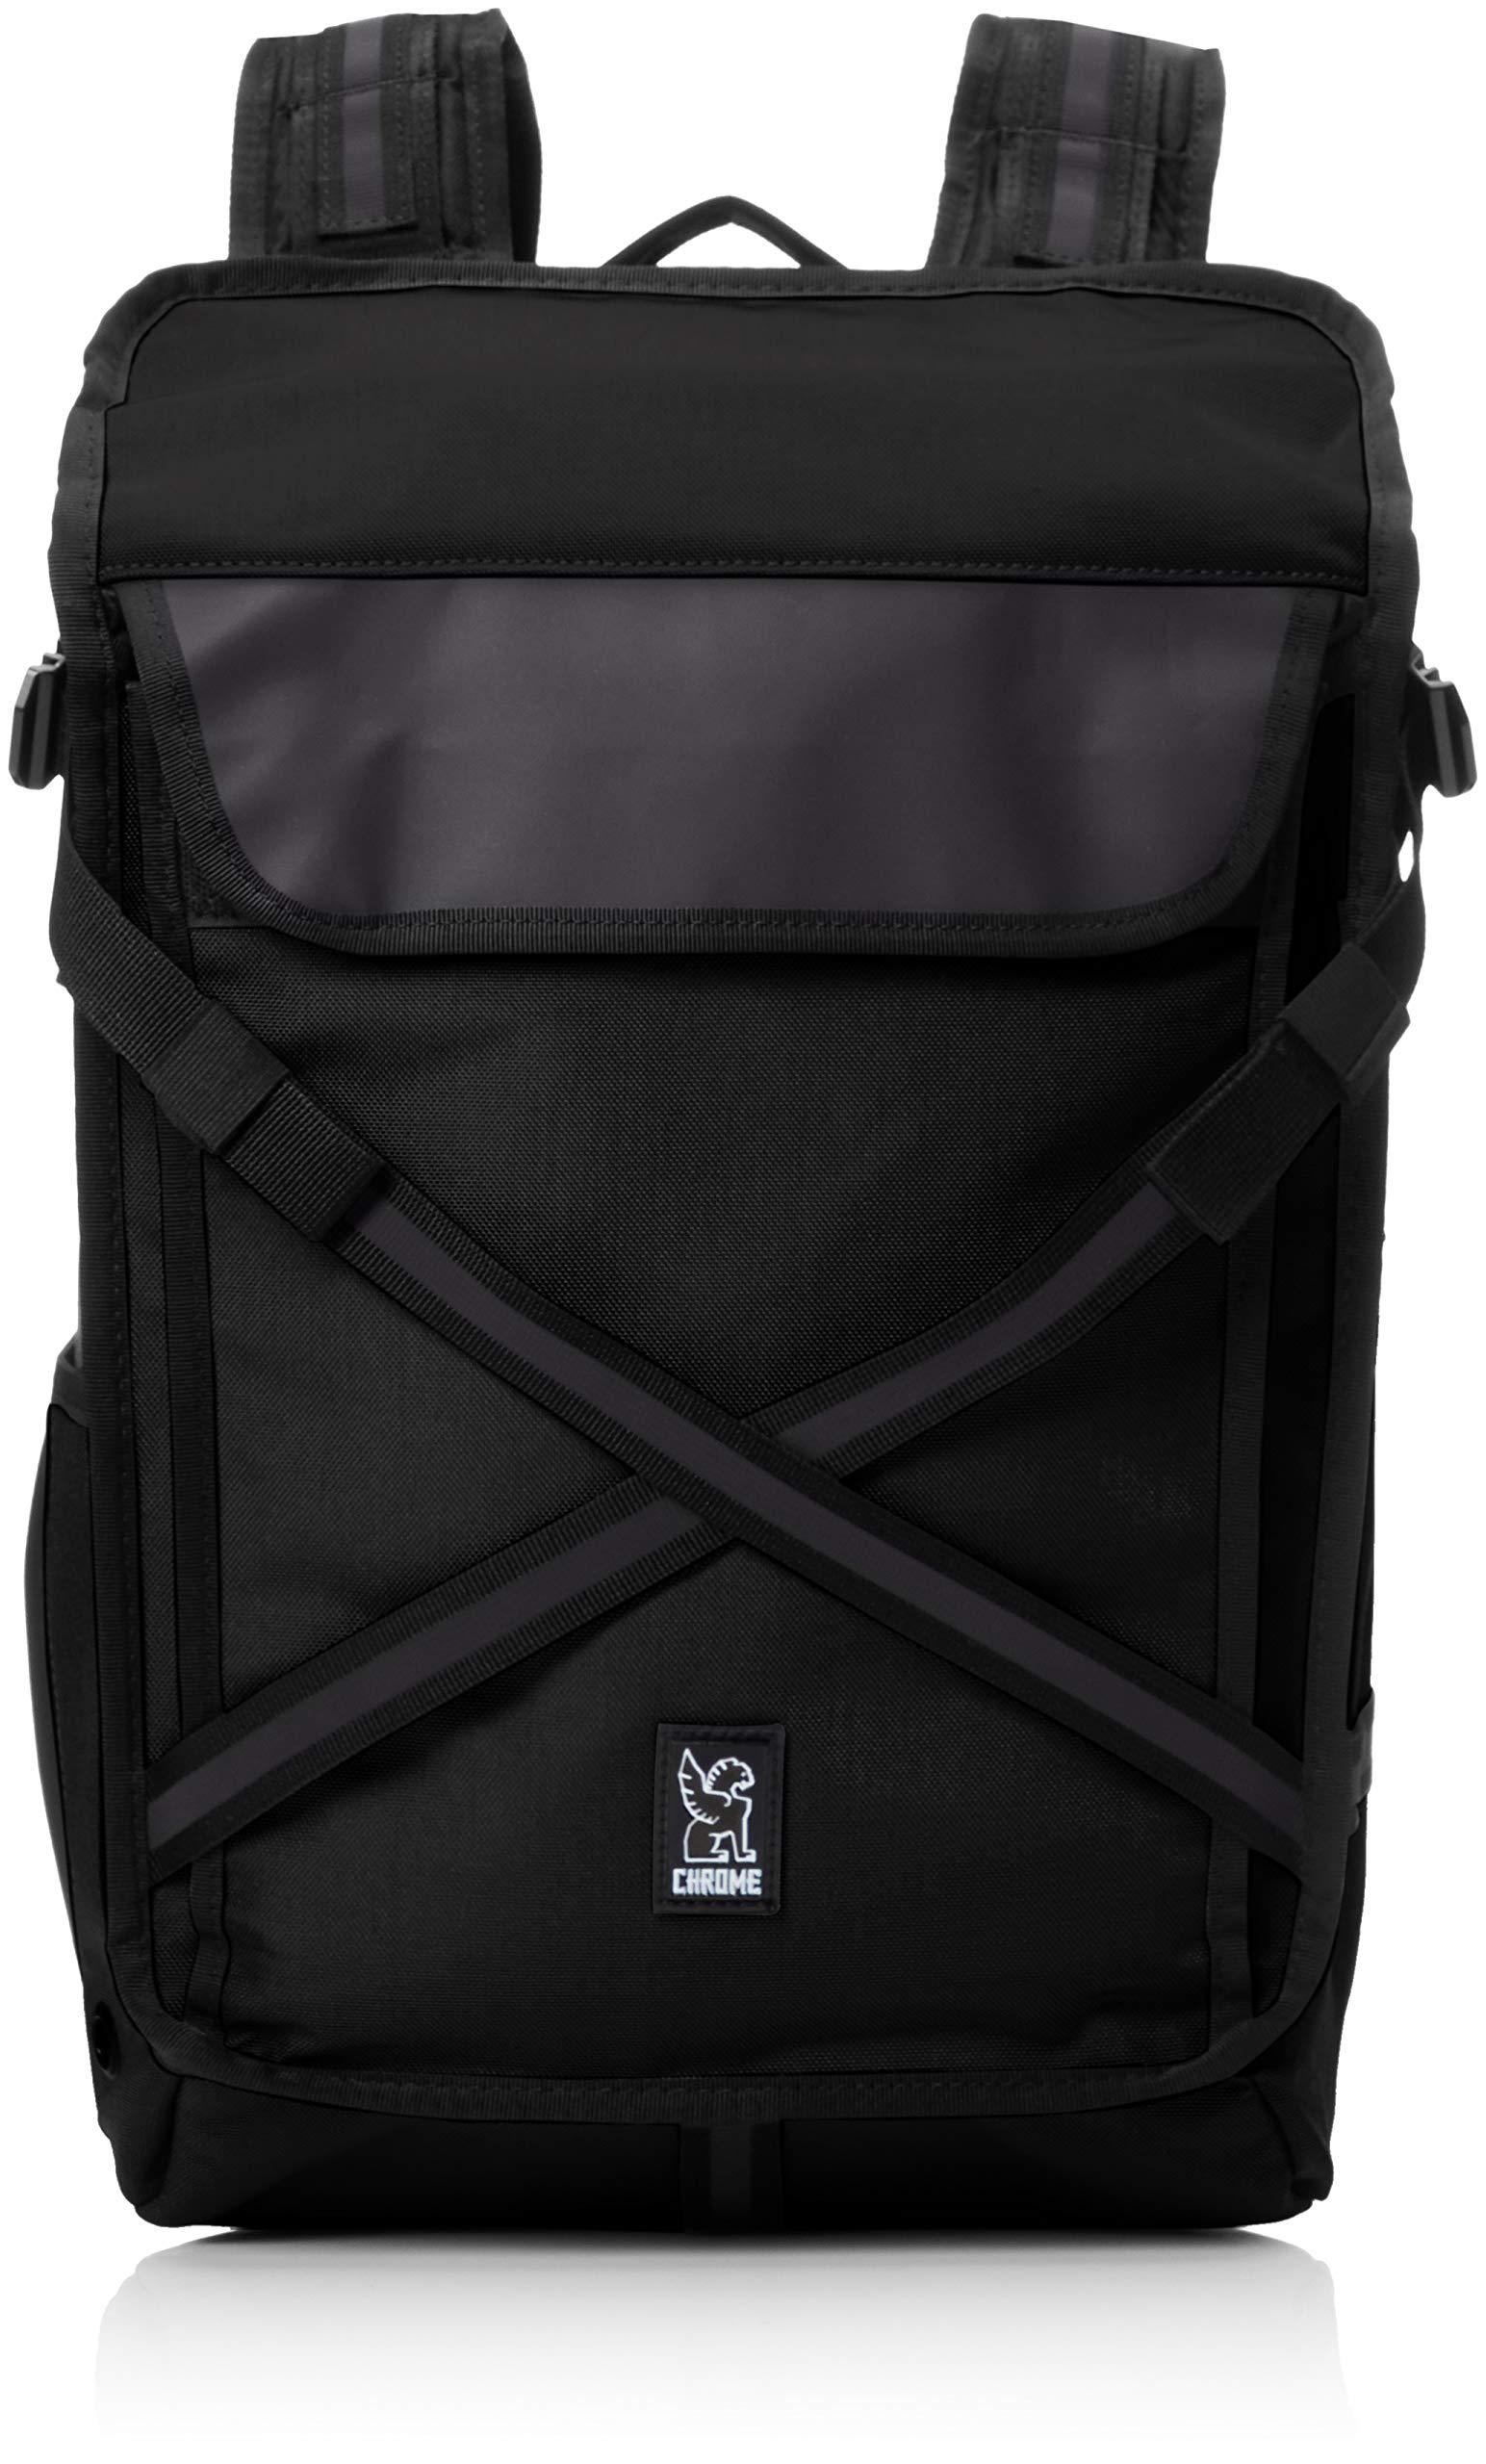 Chrome industries | Echo Bravo Bag | Black by Chrome (Image #1)